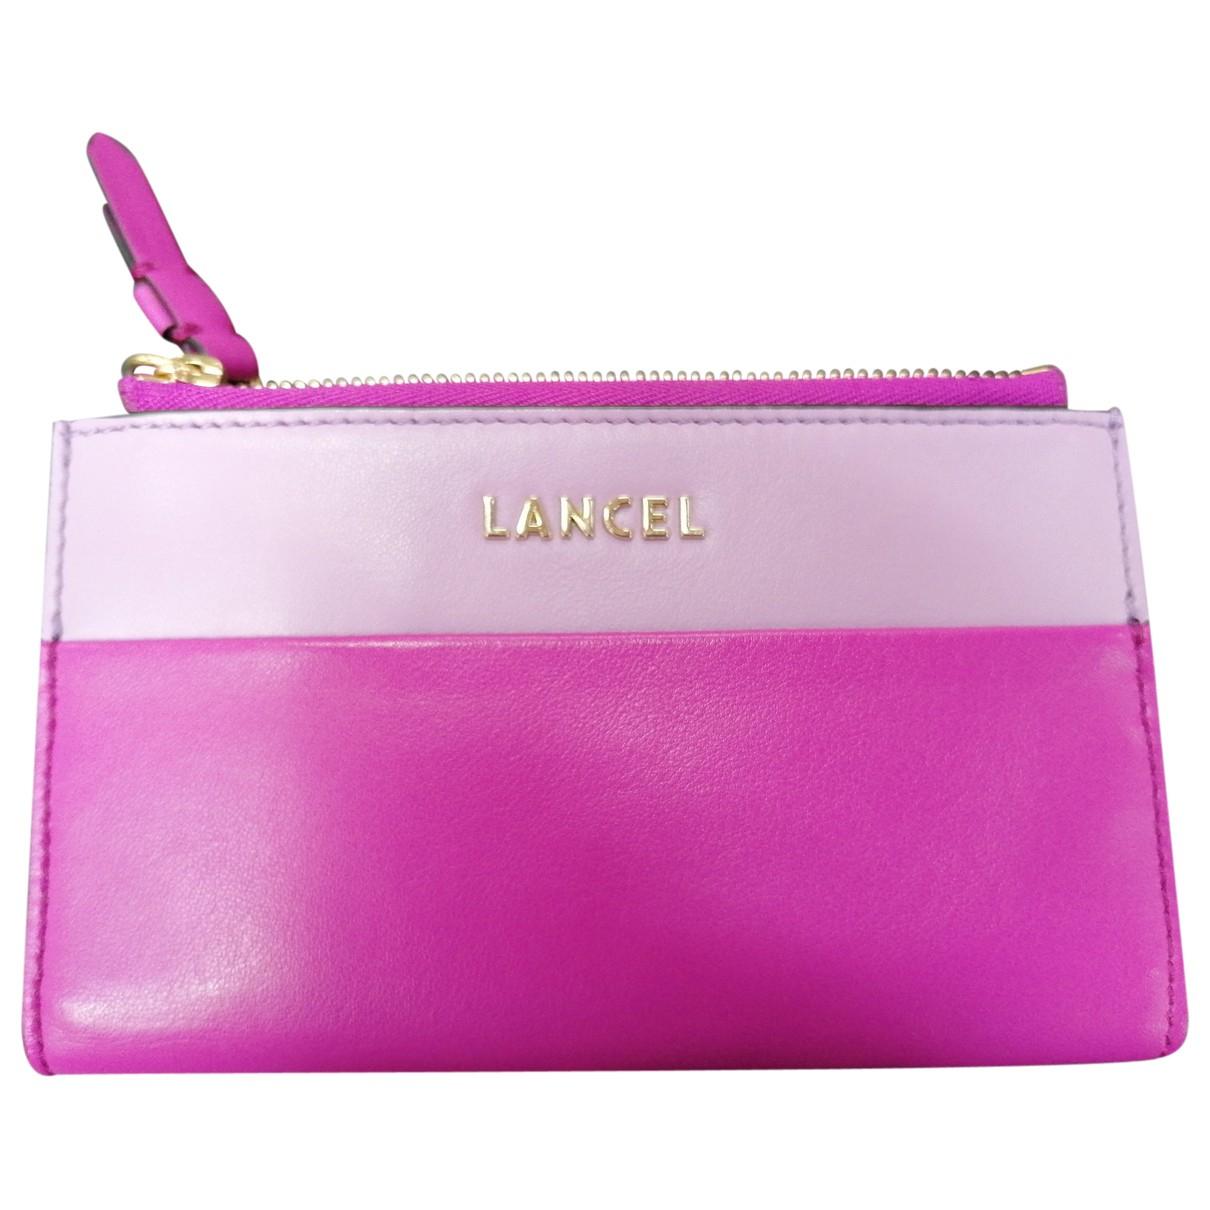 Lancel \N Pink Leather wallet for Women \N